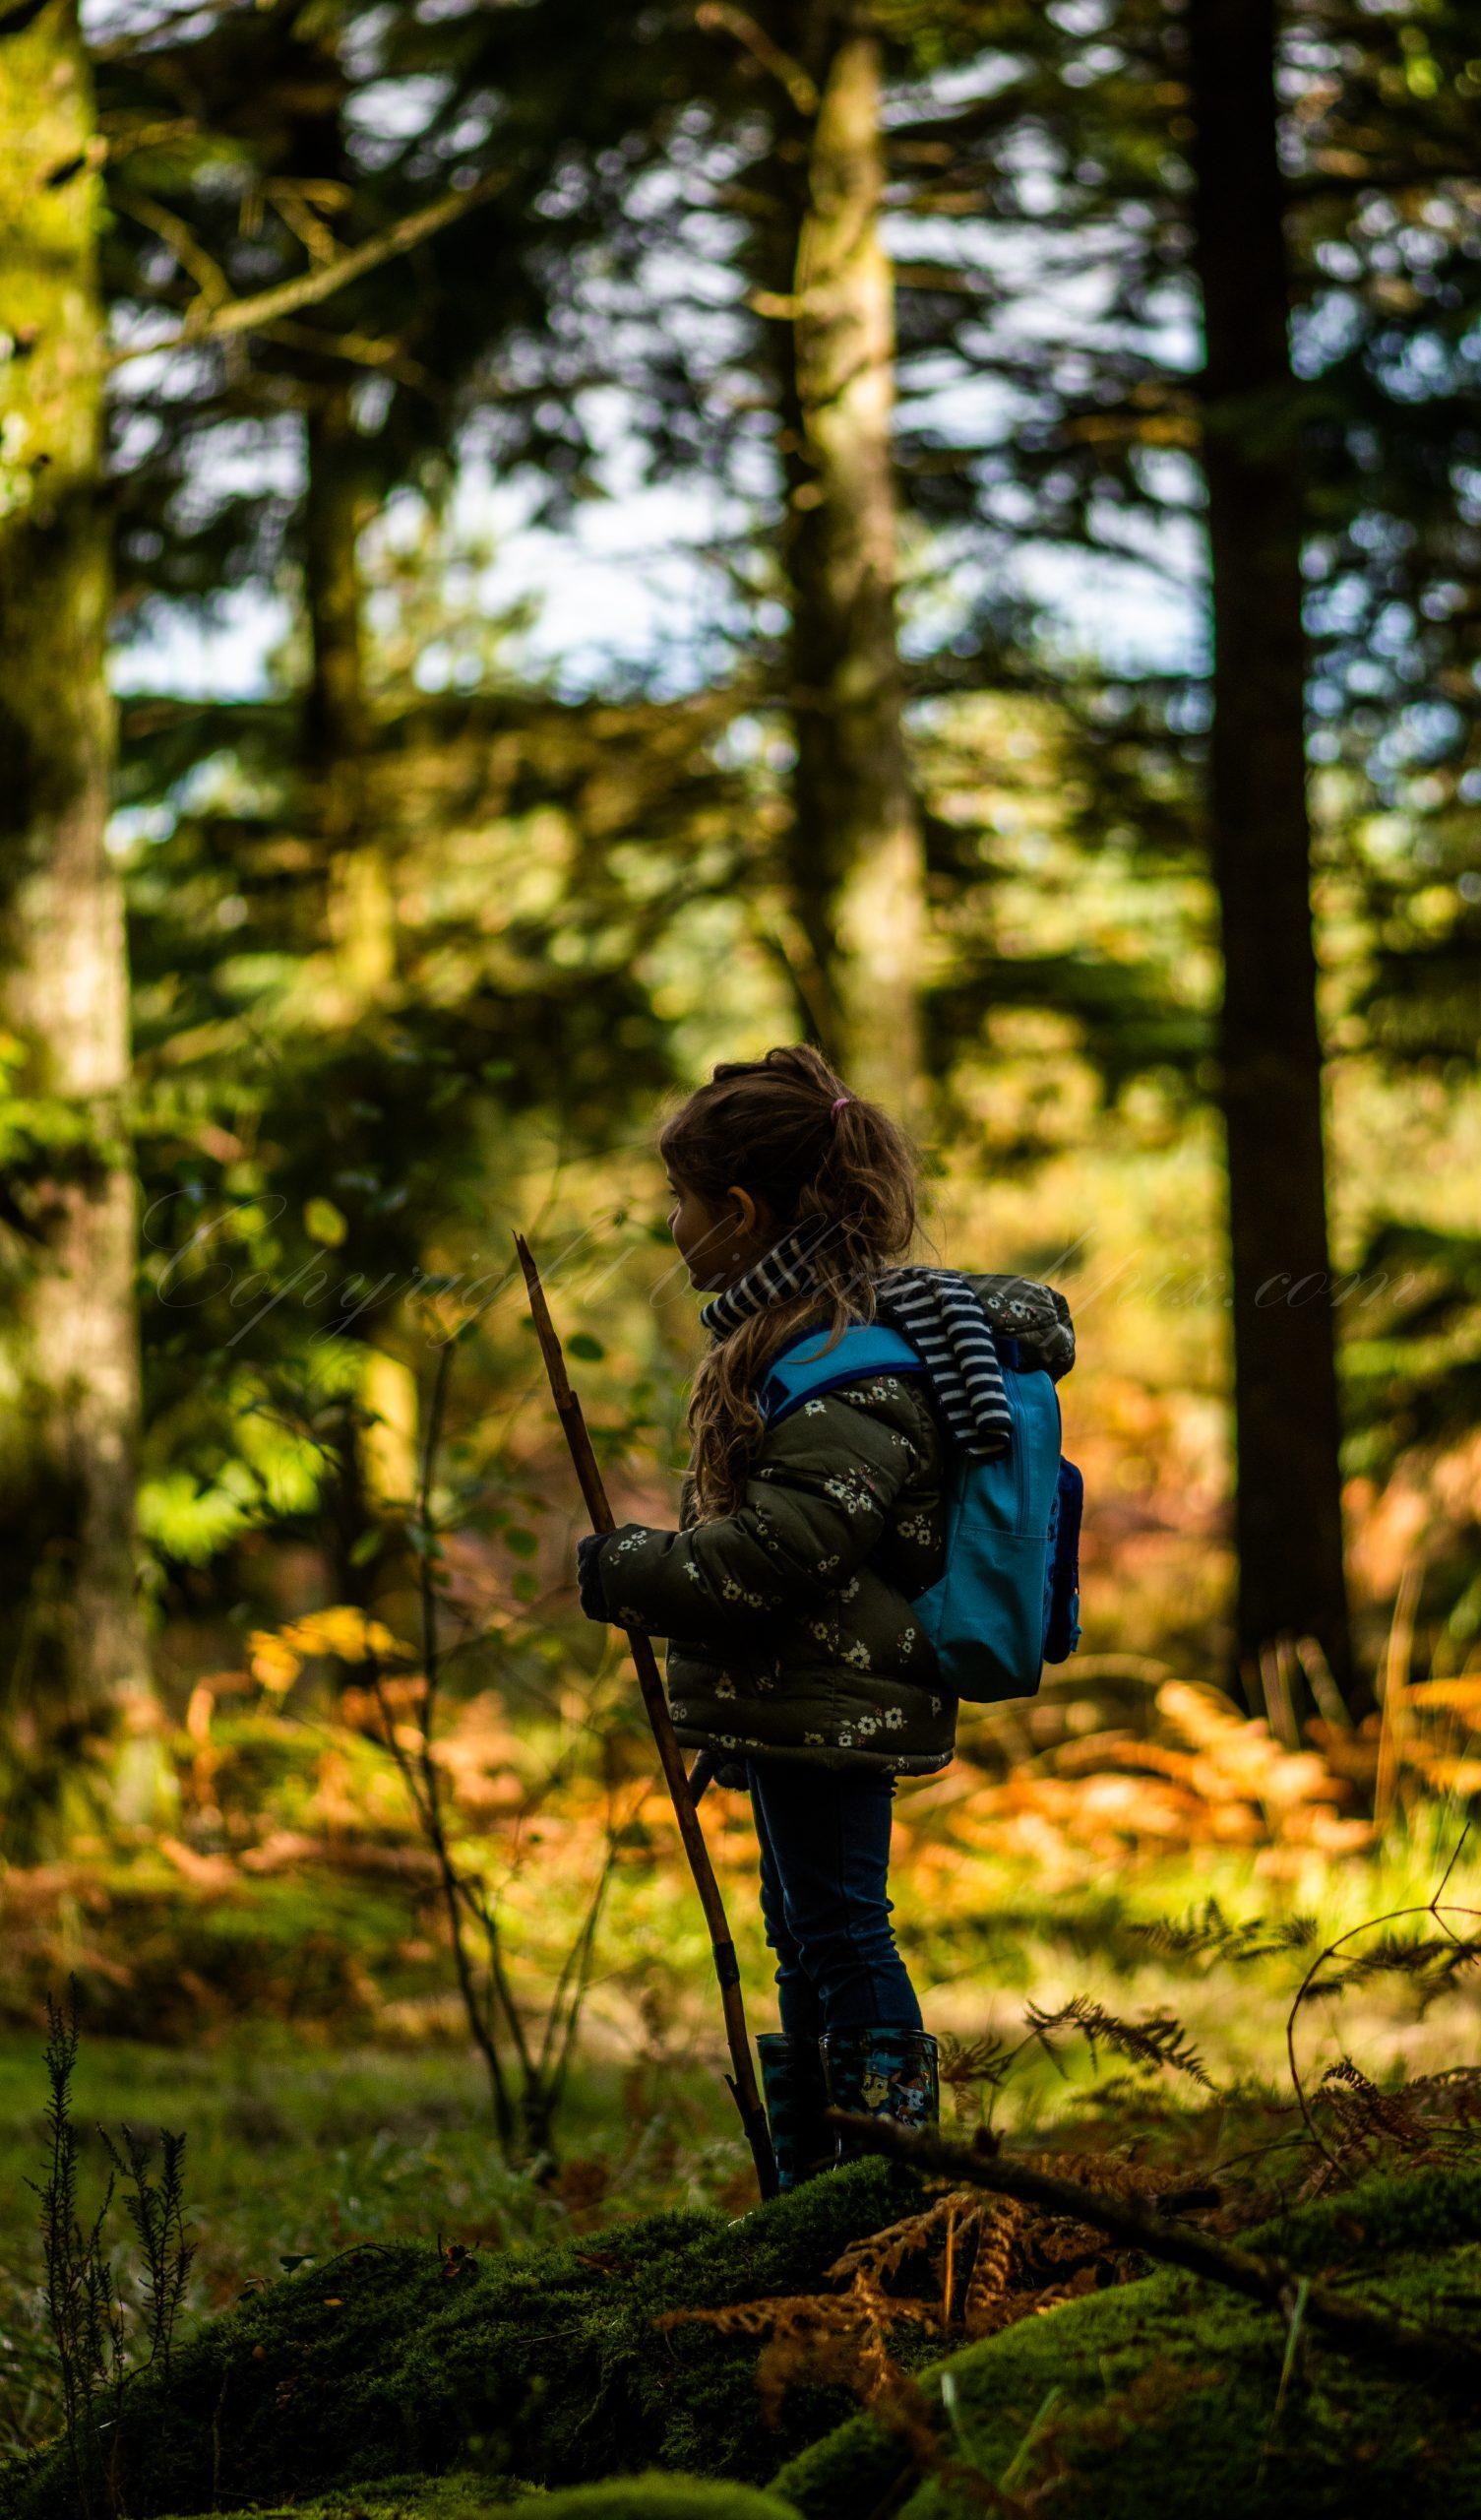 L'appel de la forêt